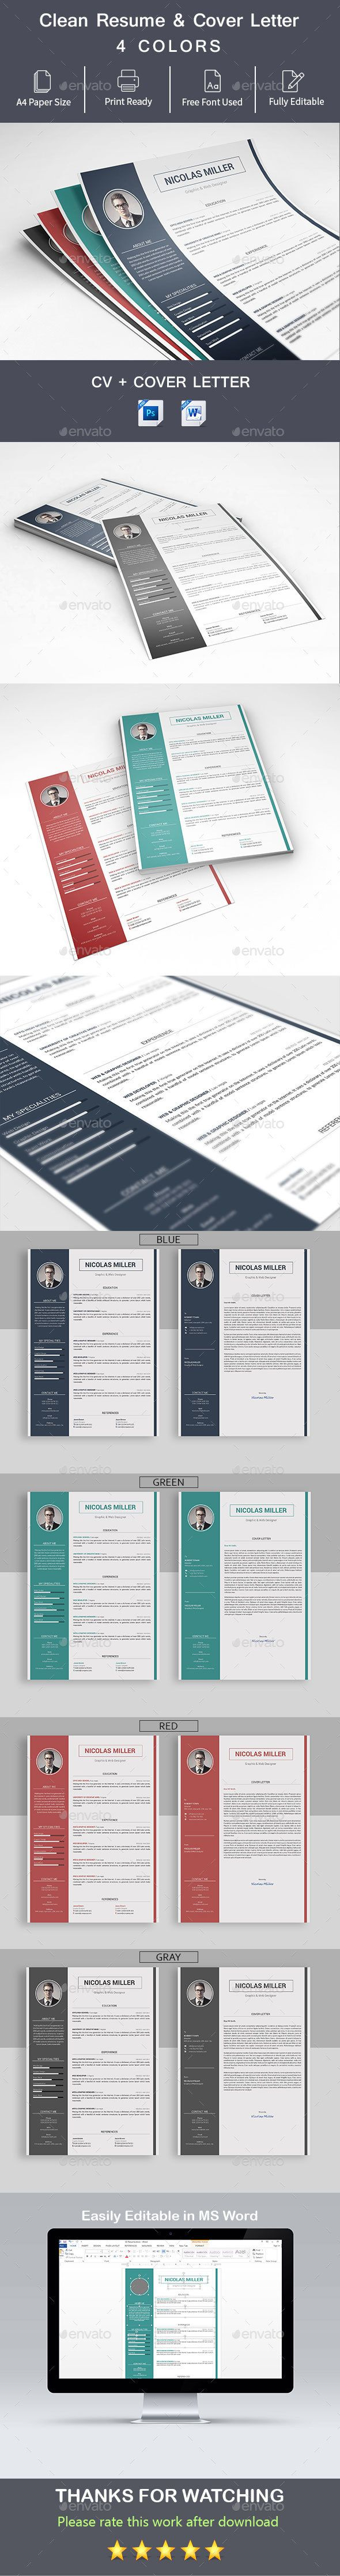 simple clean modern professional Resume template design